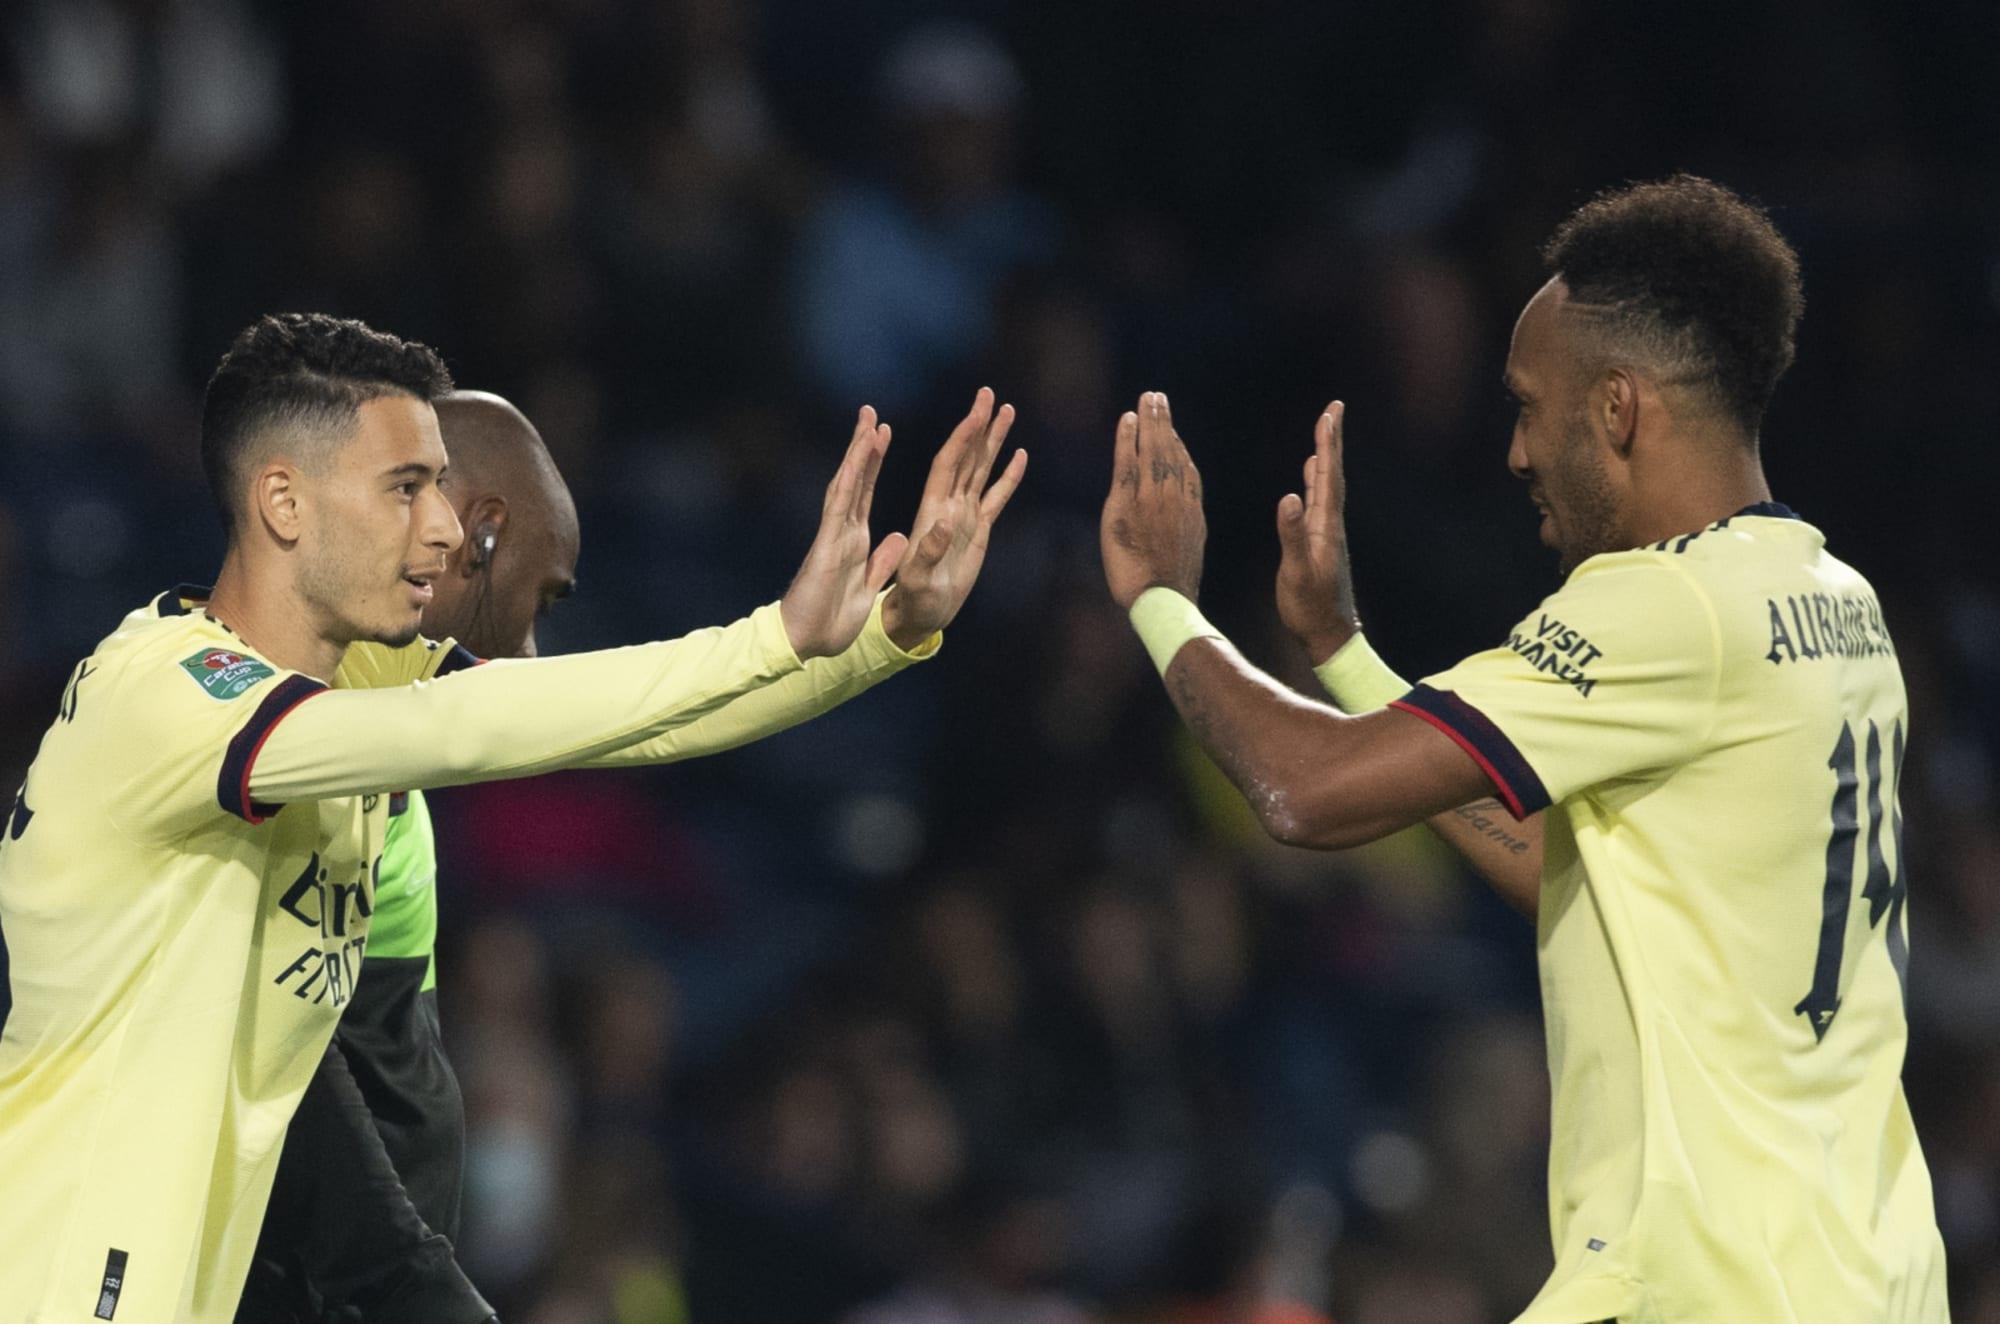 Arsenal: 4 big selection calls for Arteta vs Leeds